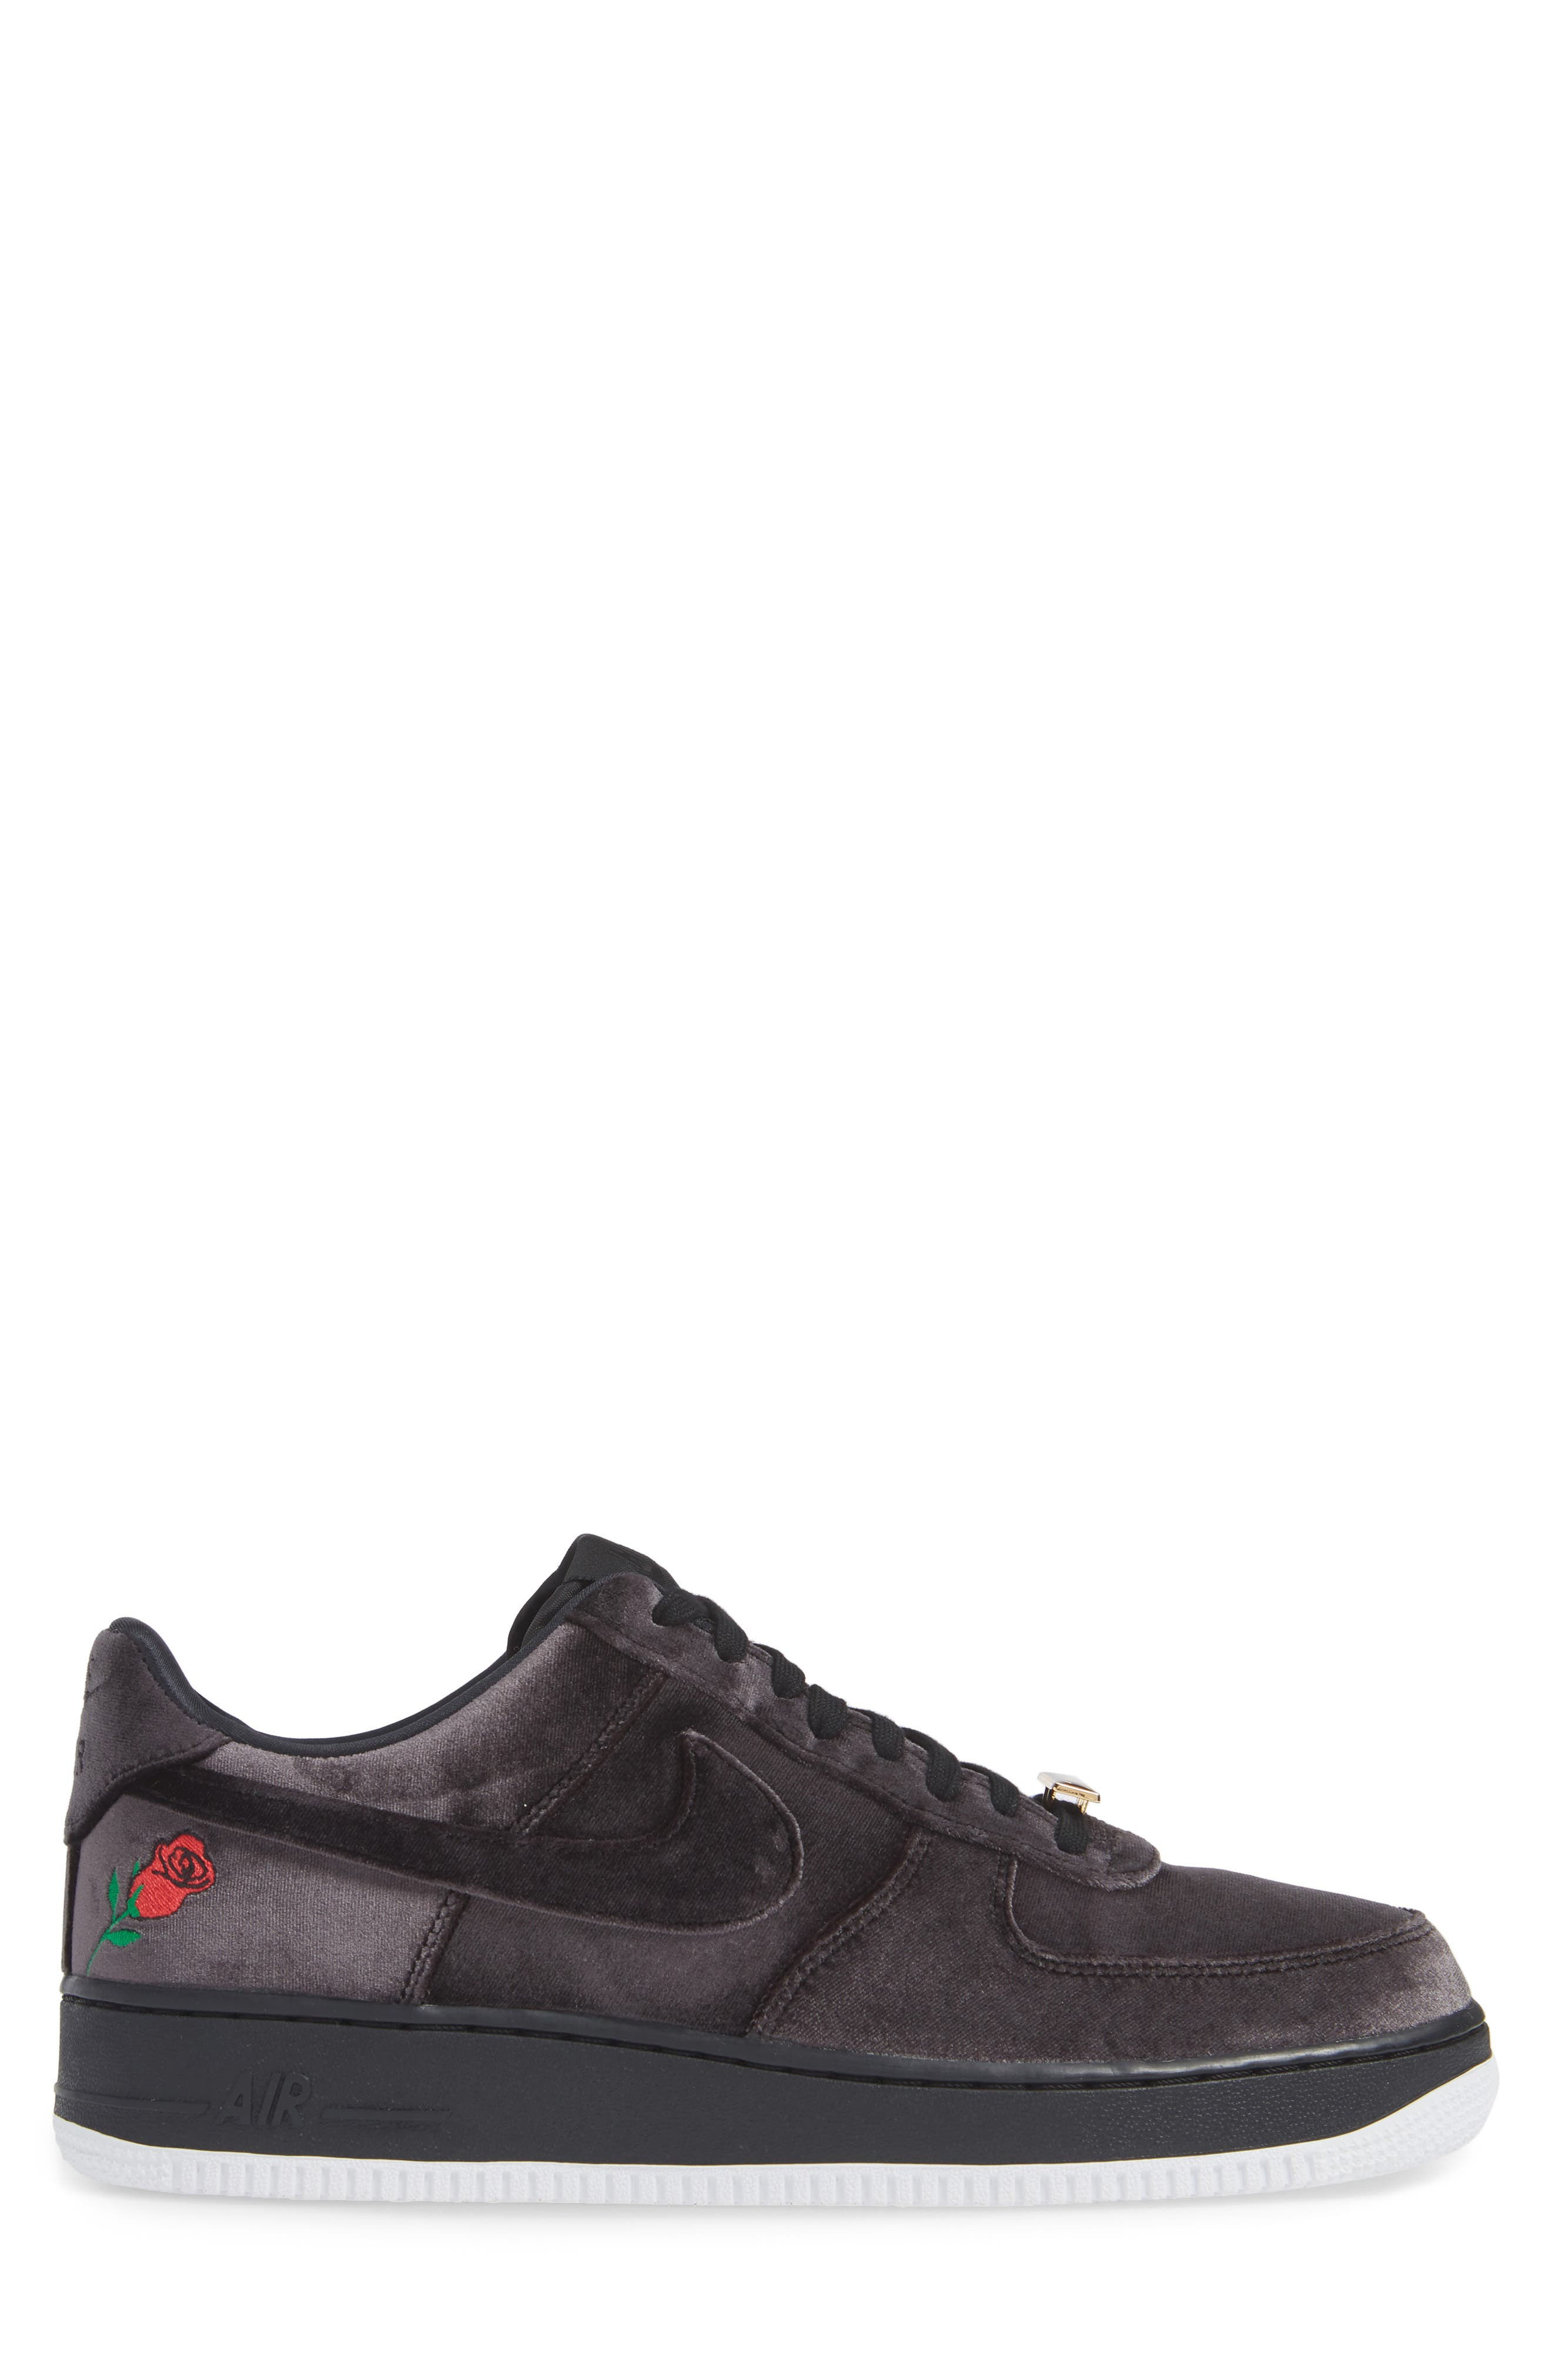 Air Force 1 '07 QS Sneaker,                             Alternate thumbnail 3, color,                             BLACK/ BLACK/ WHITE